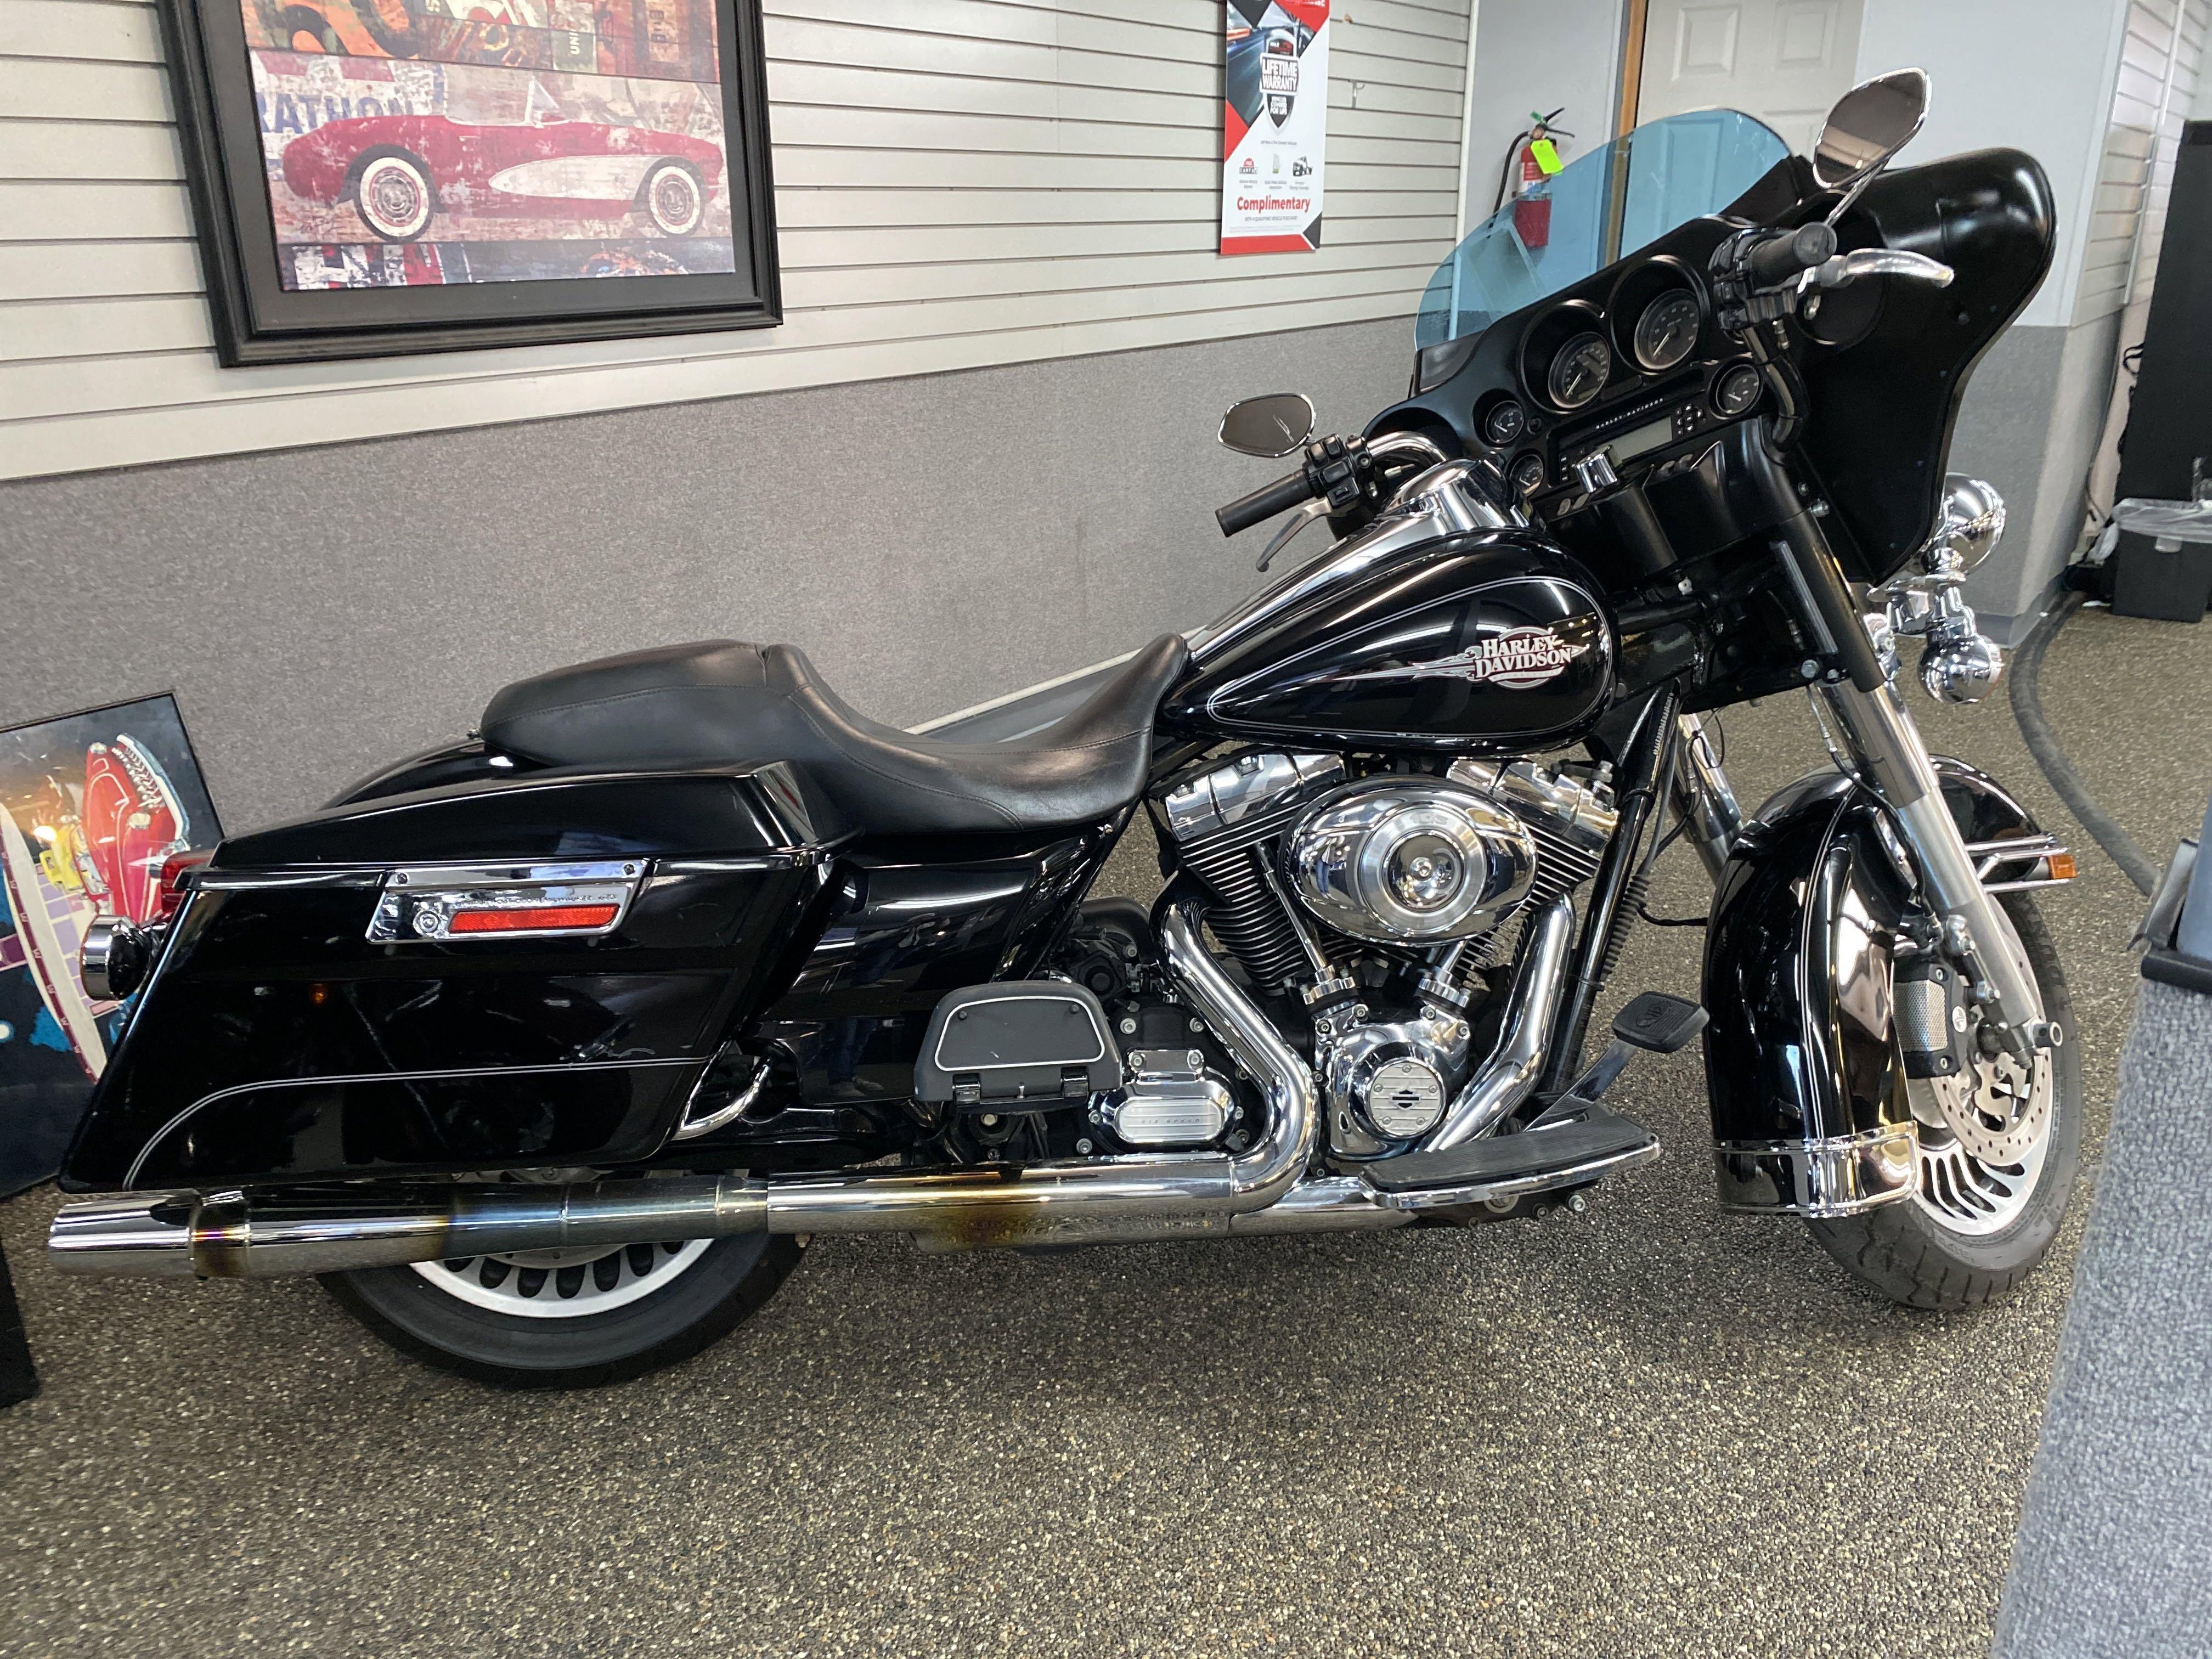 2012 Harley-Davidson FLHTC FLHTC